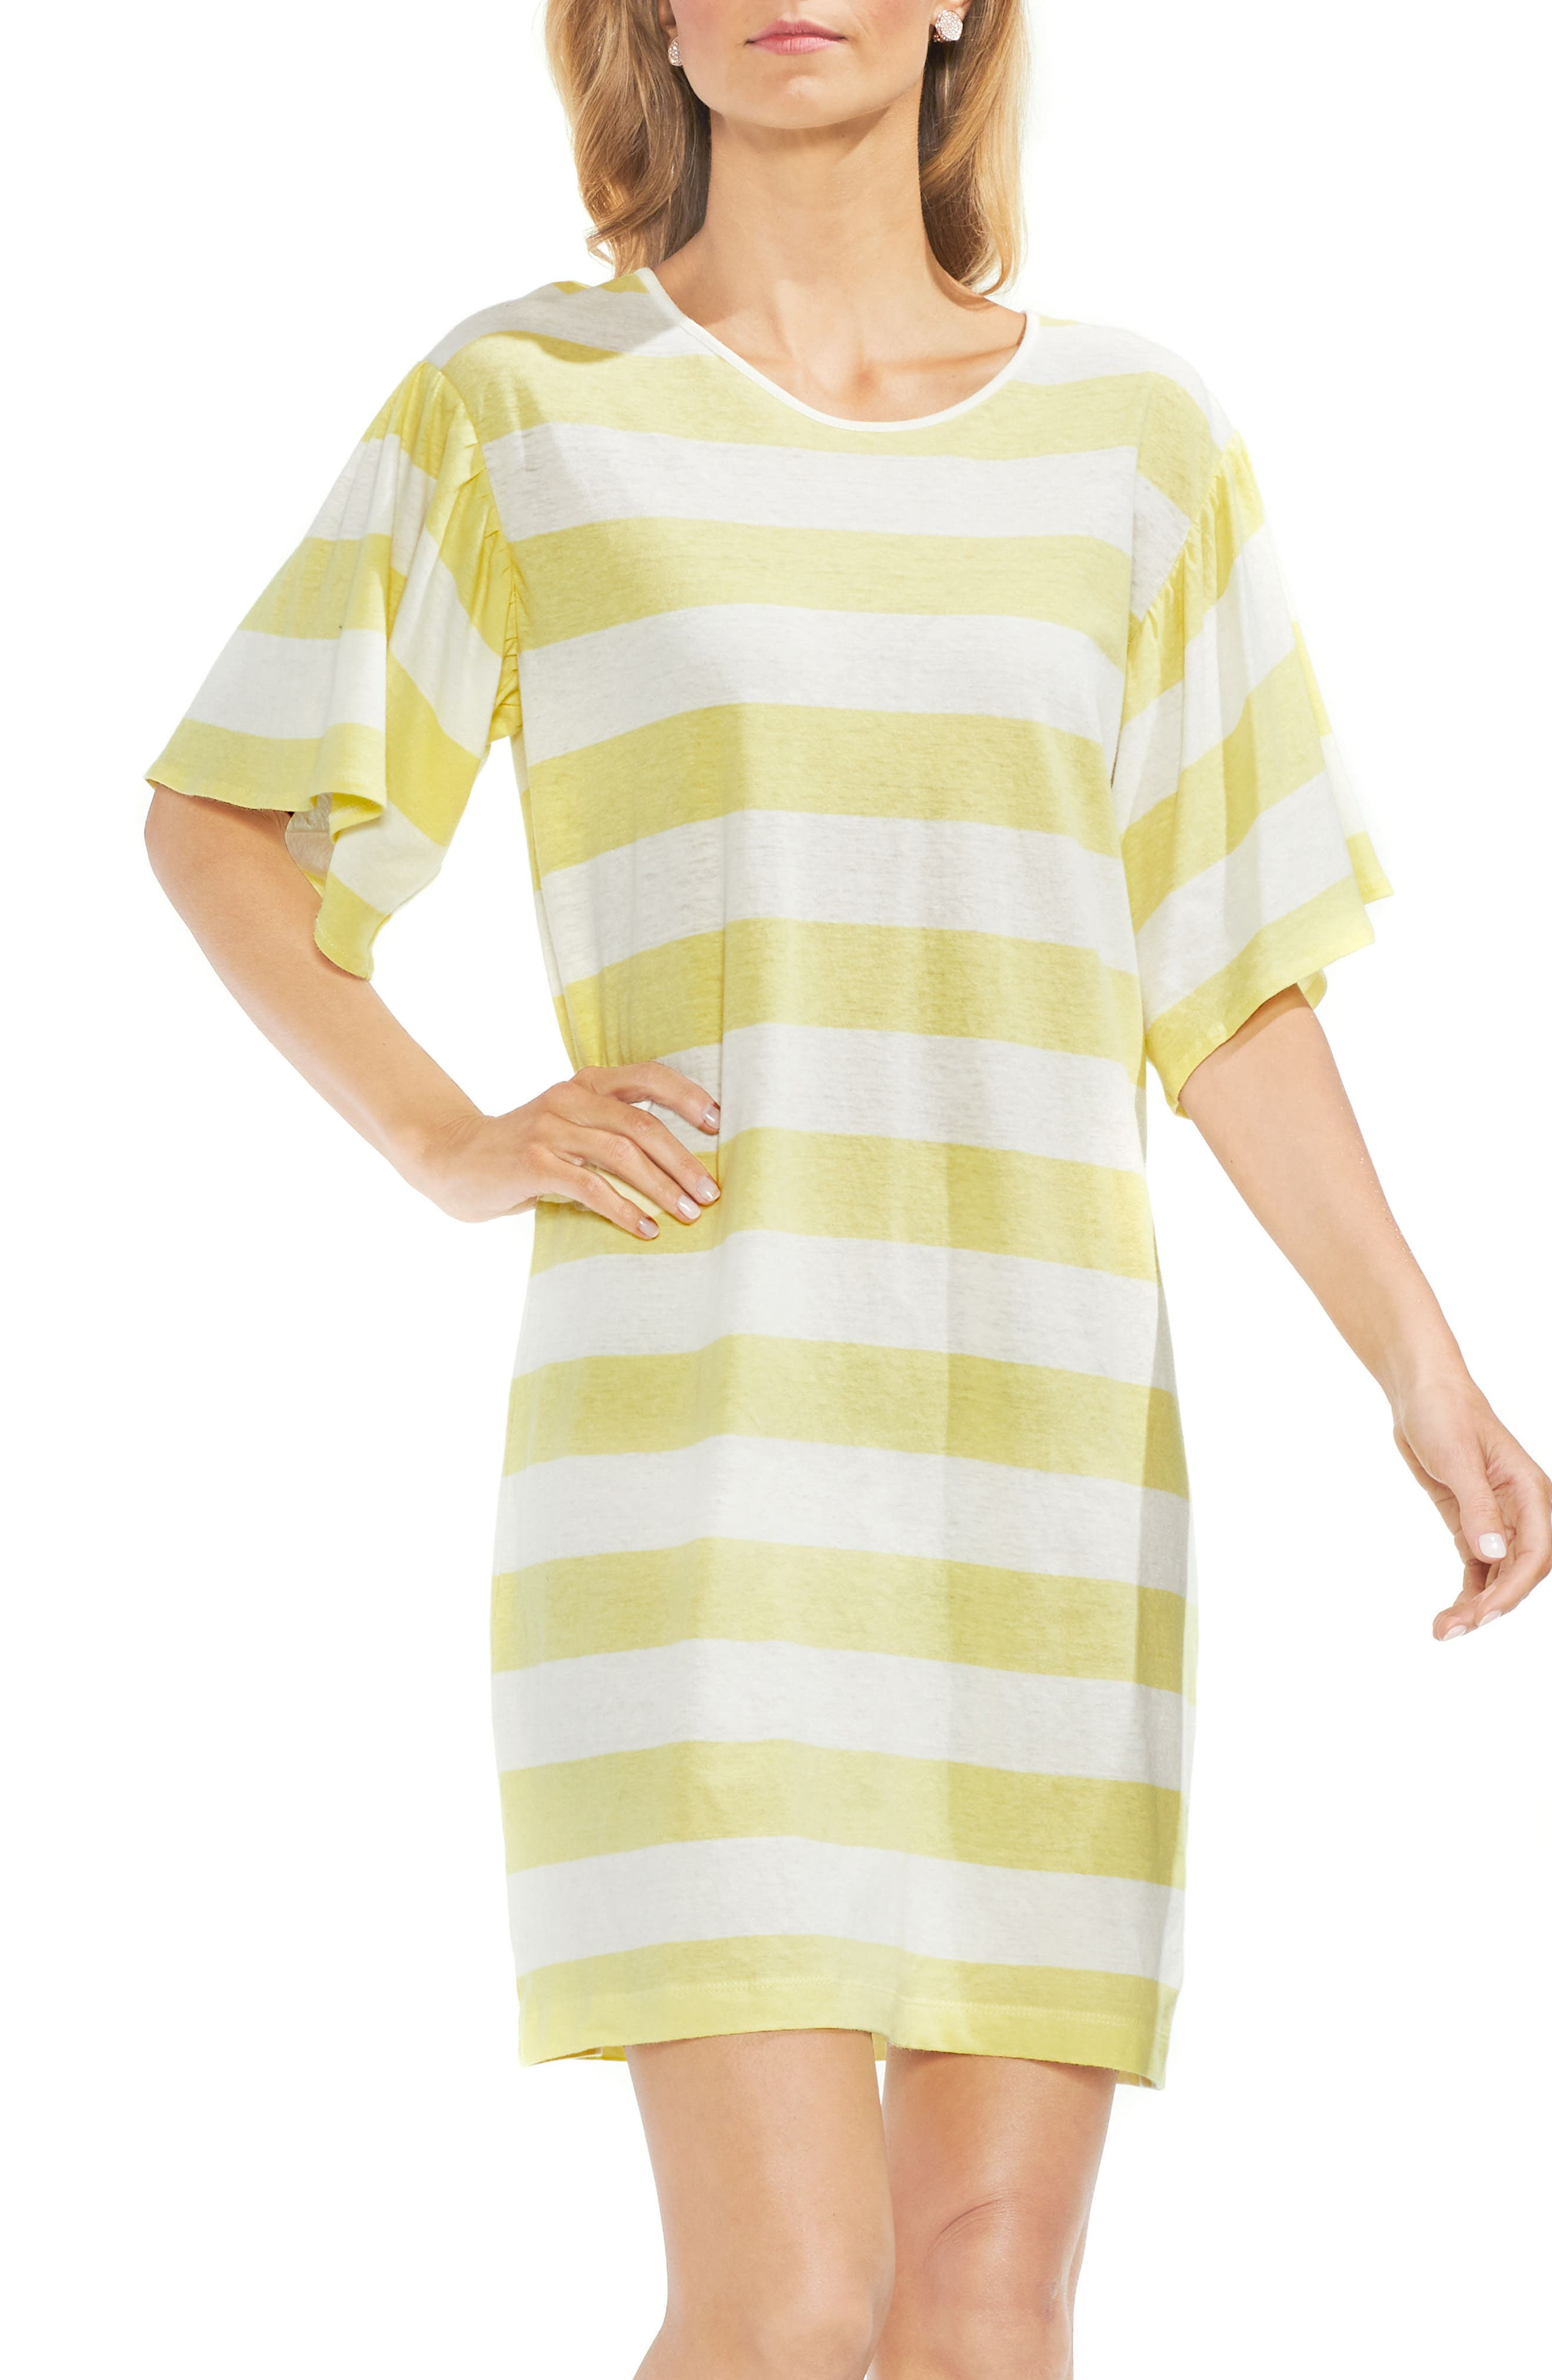 Main Image - Vince Camuto Ruffle Sleeve Stripe T-Shirt Dress